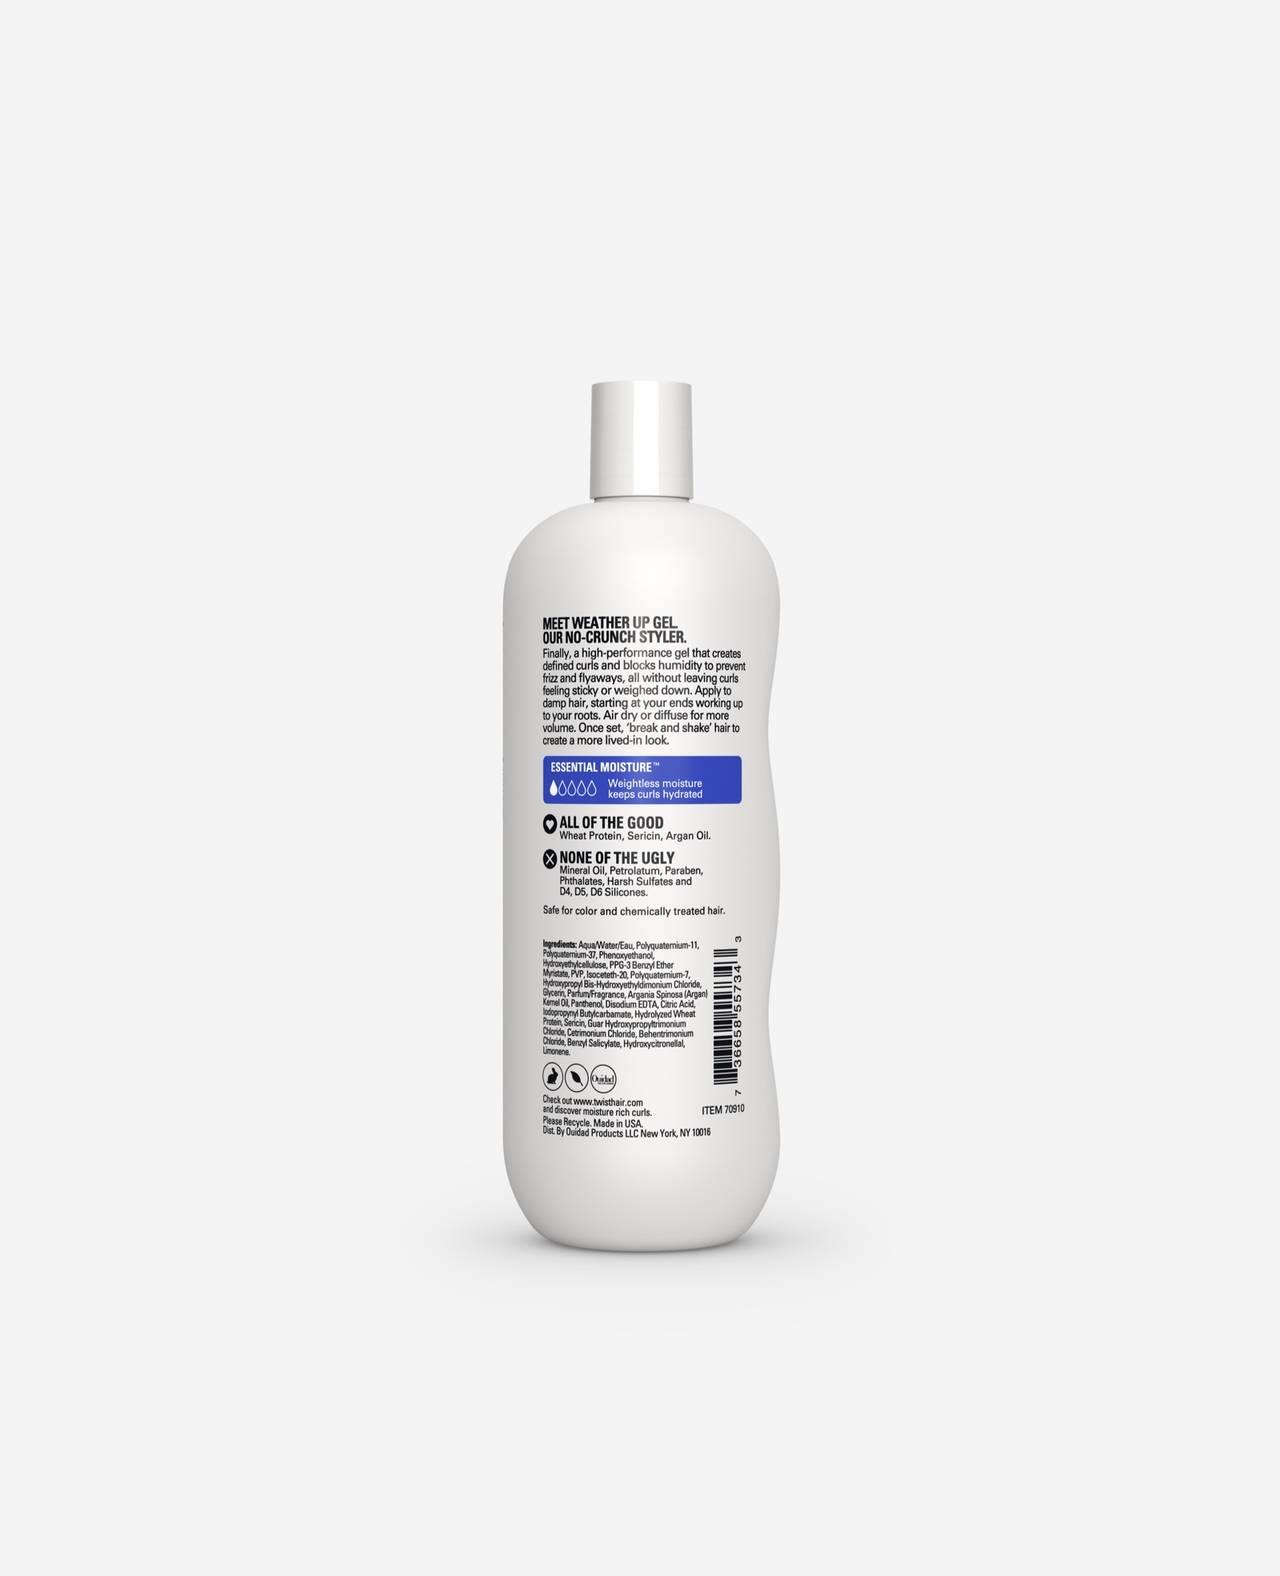 Twist Weather Up Gel Weightless Curl Defining Gel Essential Moisture for Curls 10.5 fl. Oz. back of  bottle